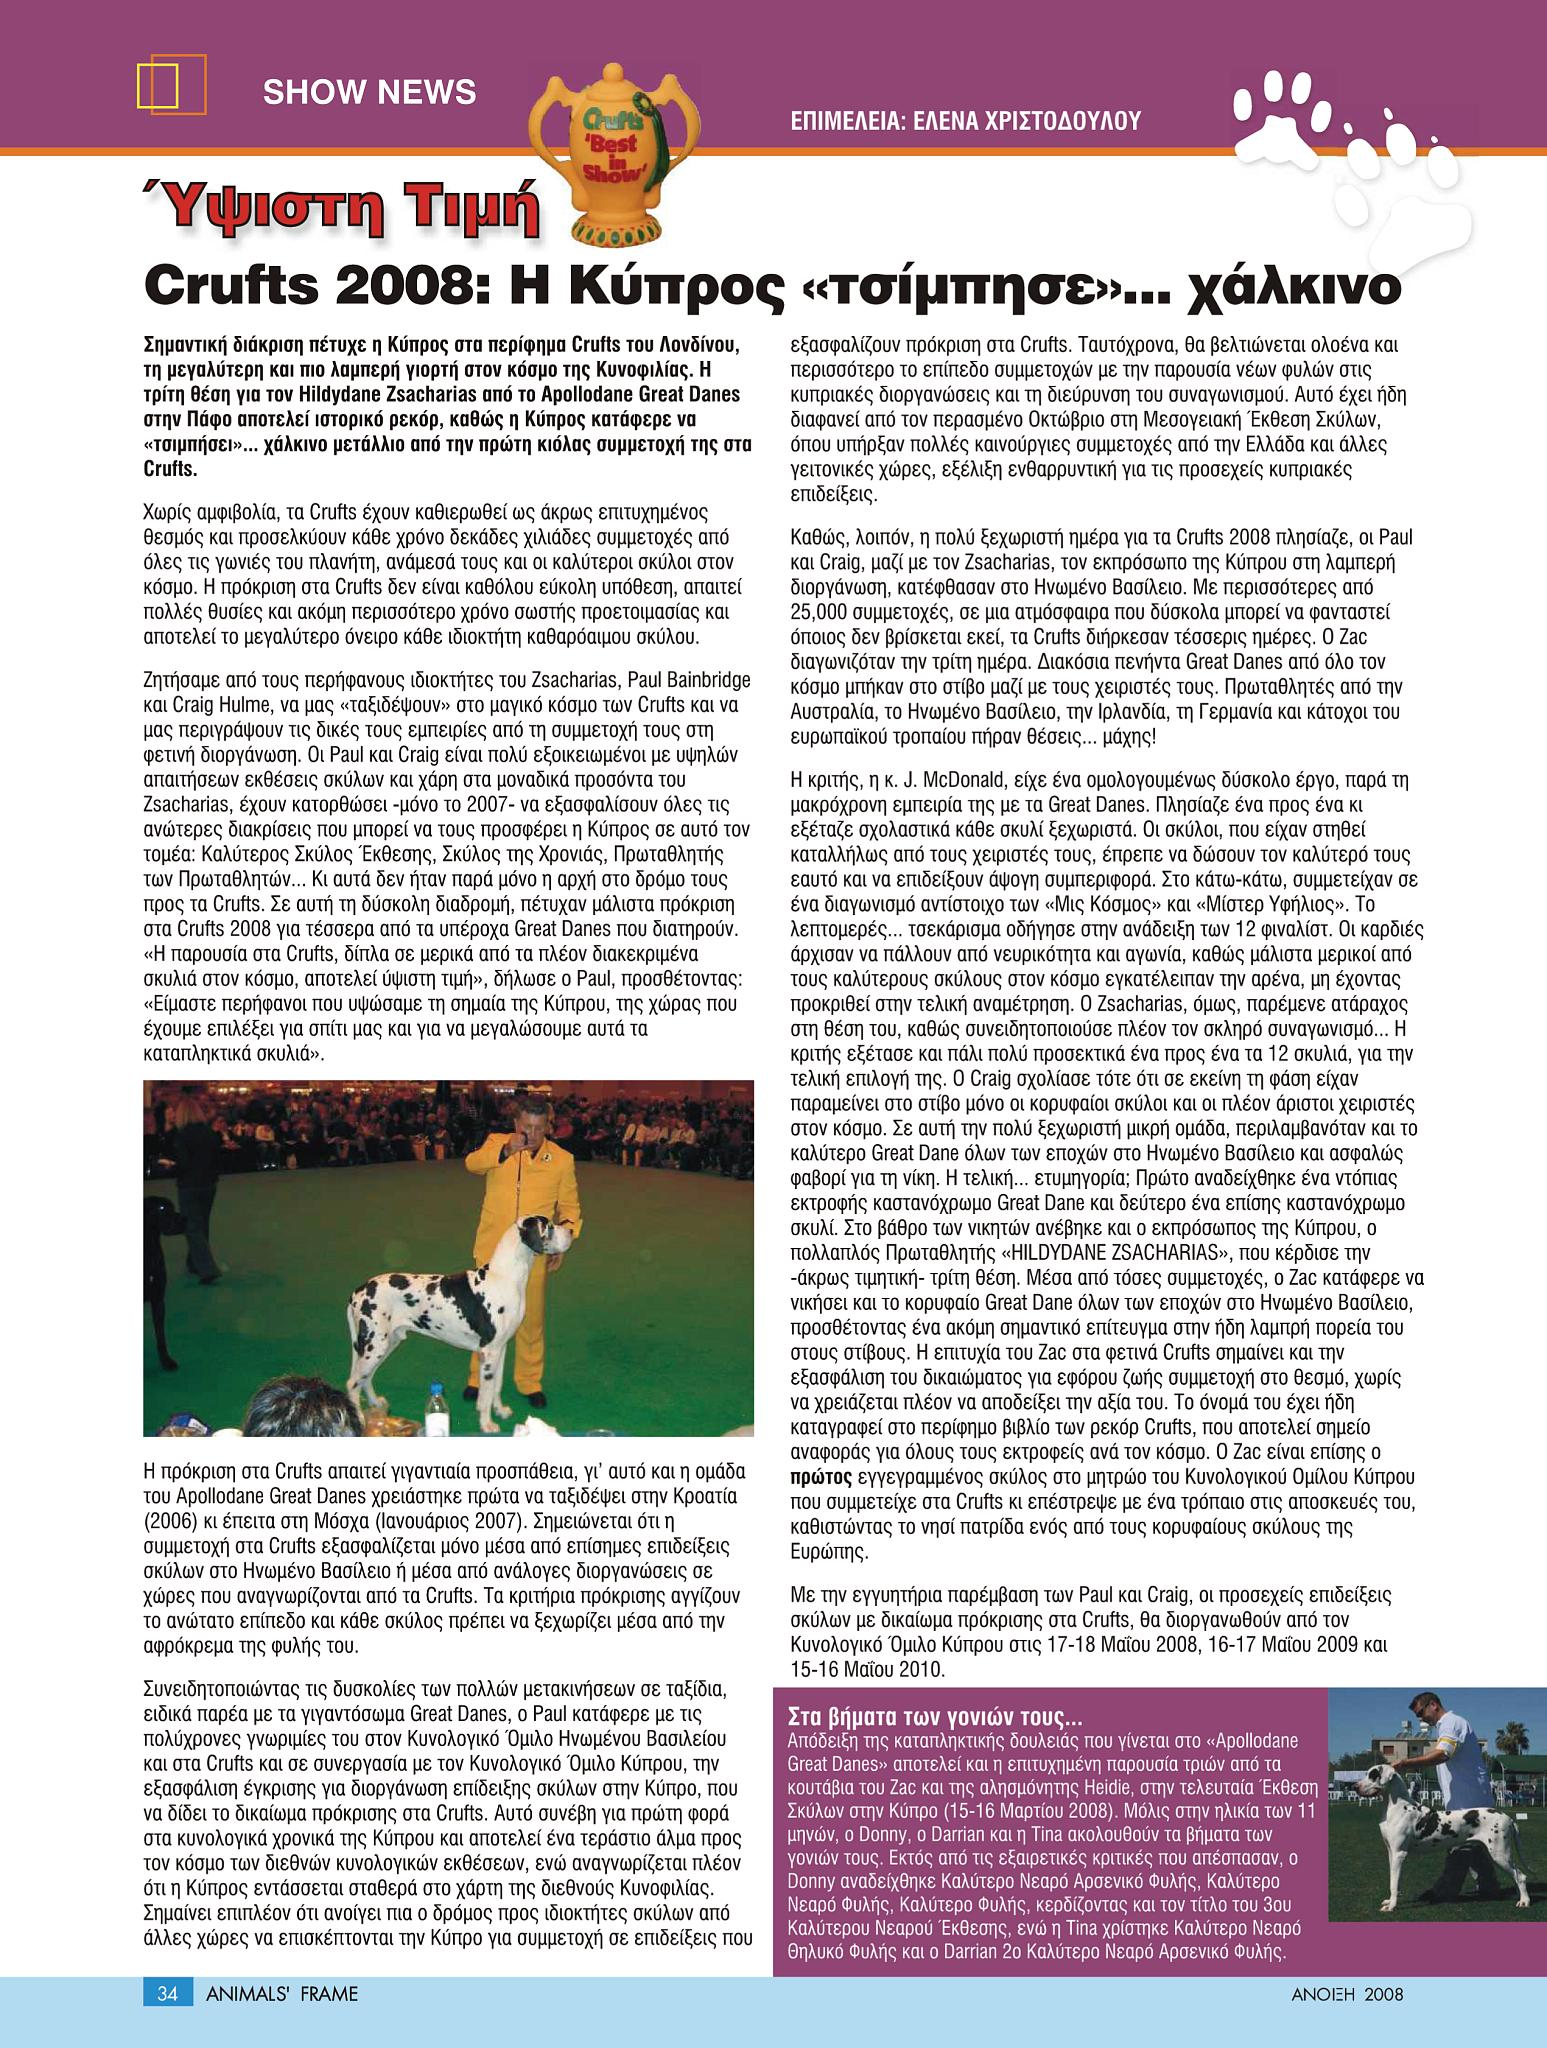 Apollodane Great Danes » Press: Animals\' Frame Magazine Article ...